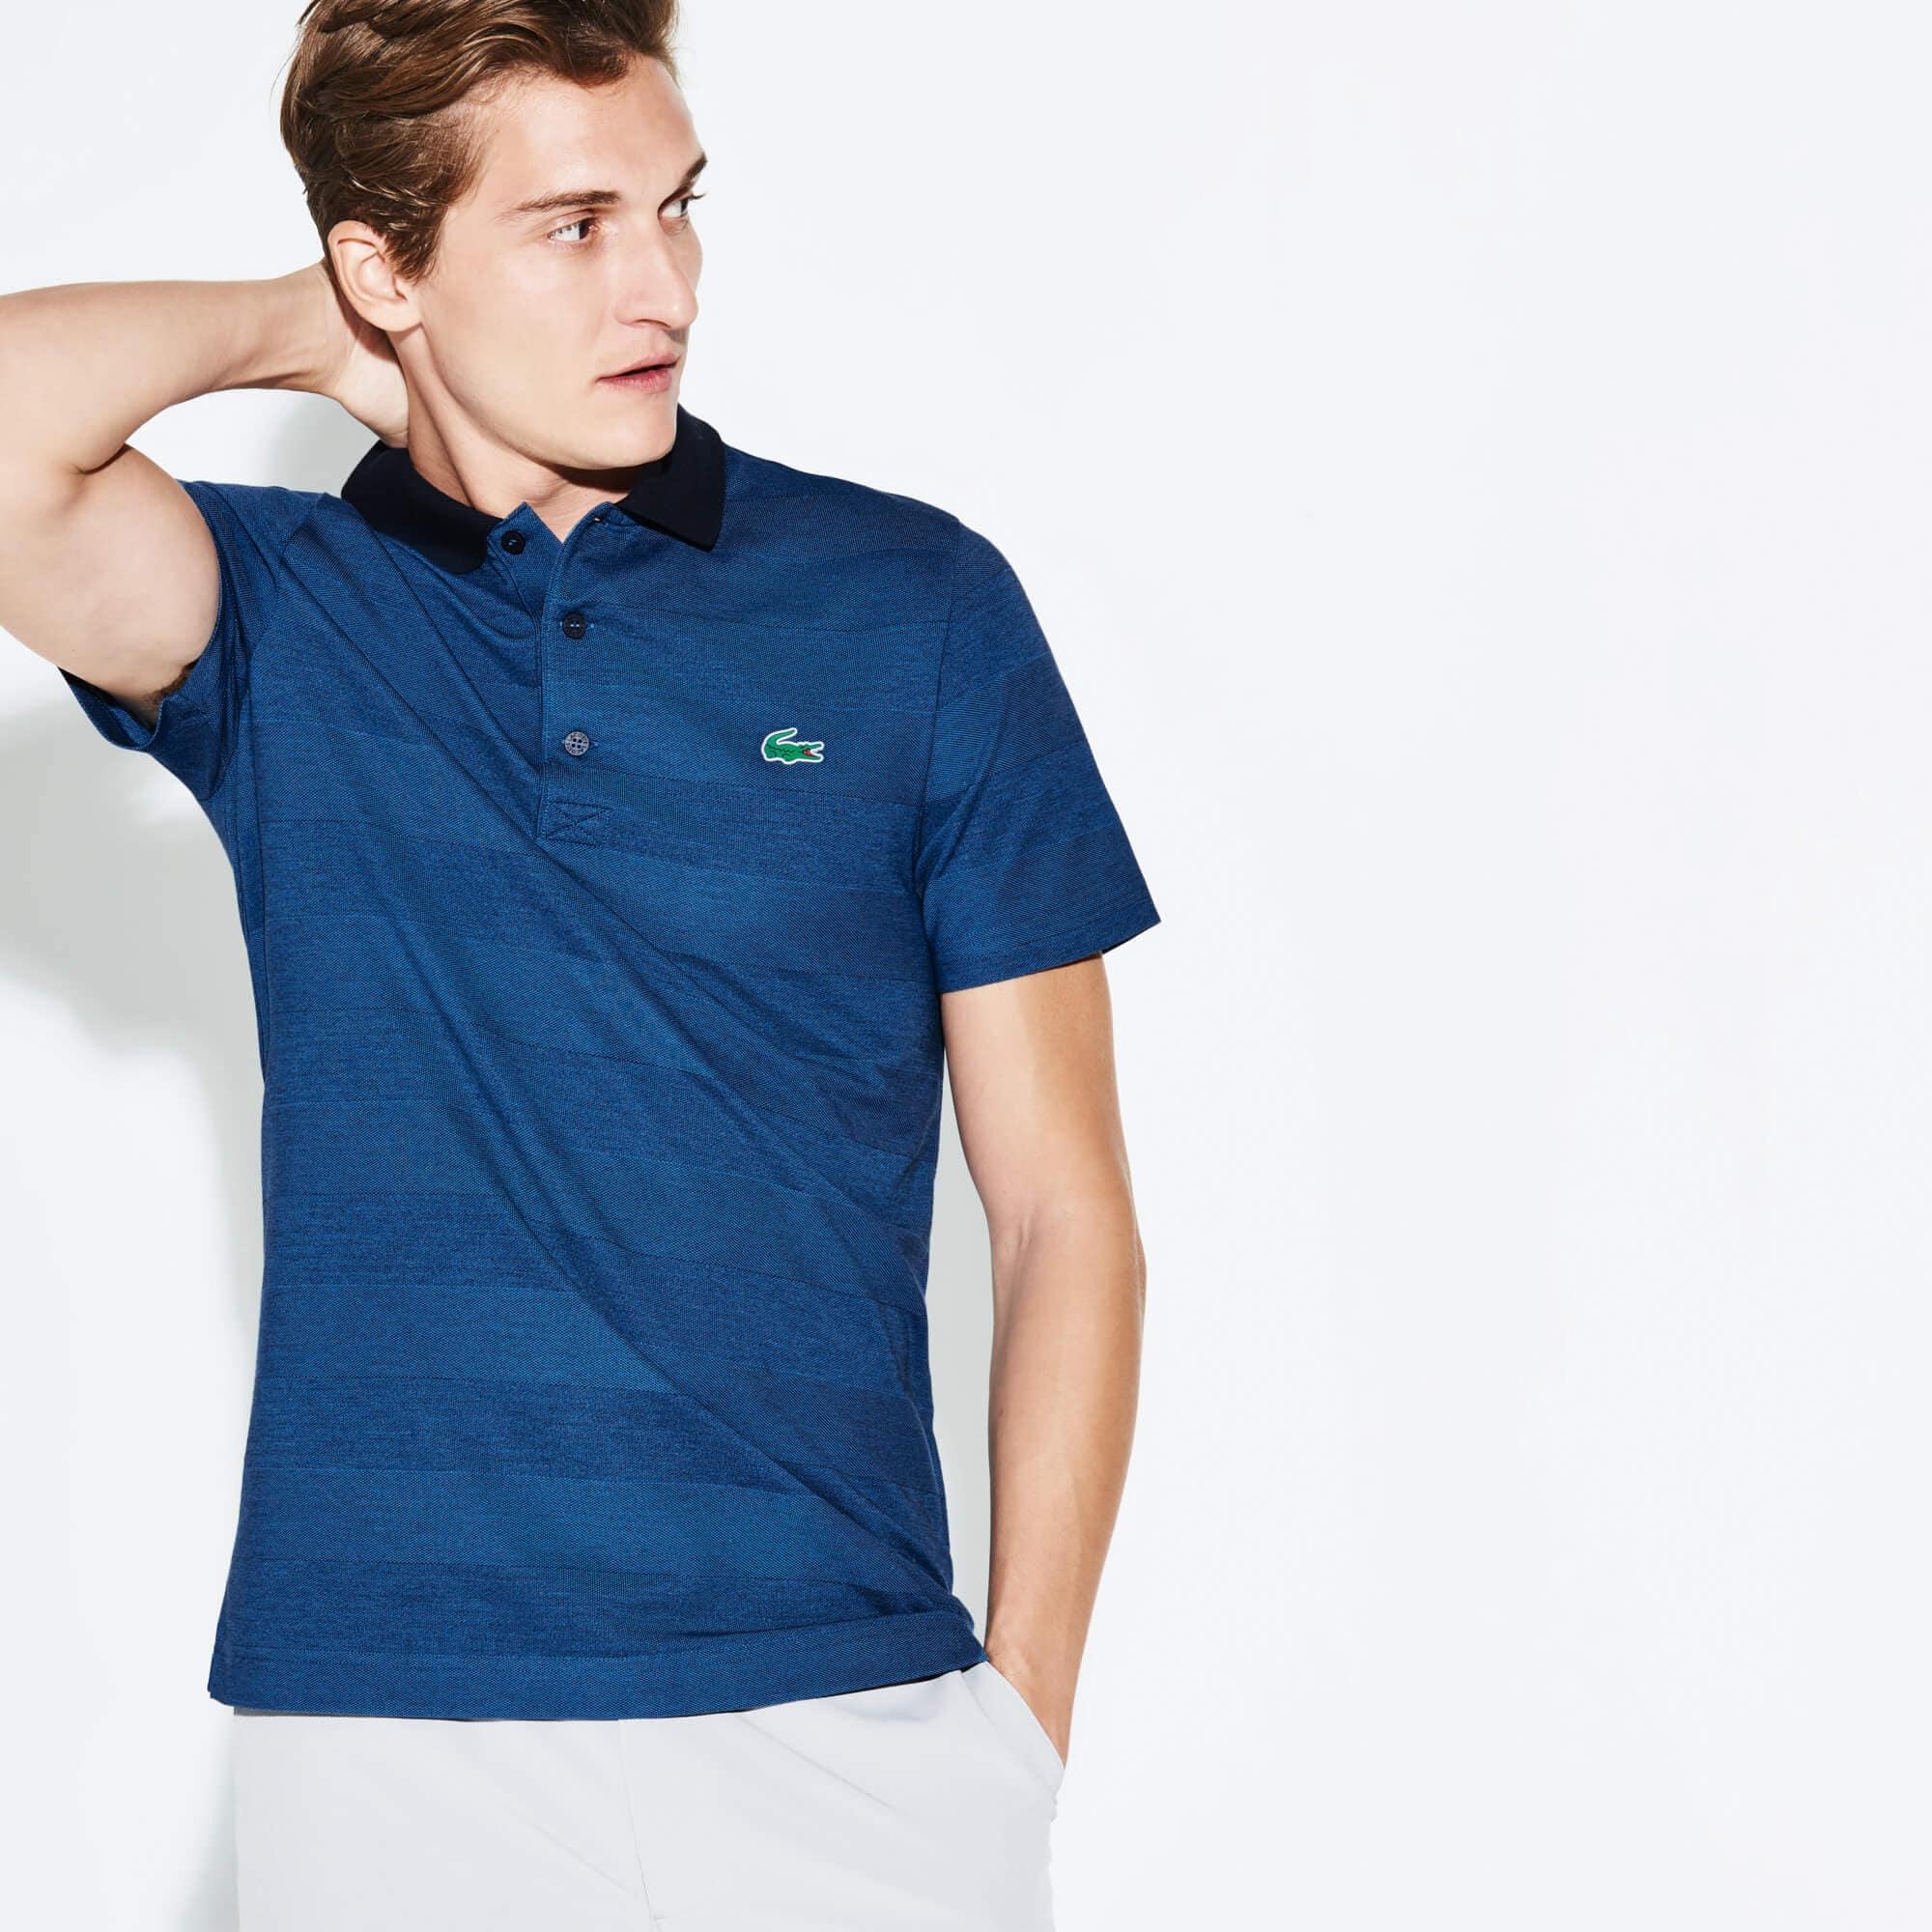 Men's Lacoste SPORT Technical Jersey Golf Polo Shirt